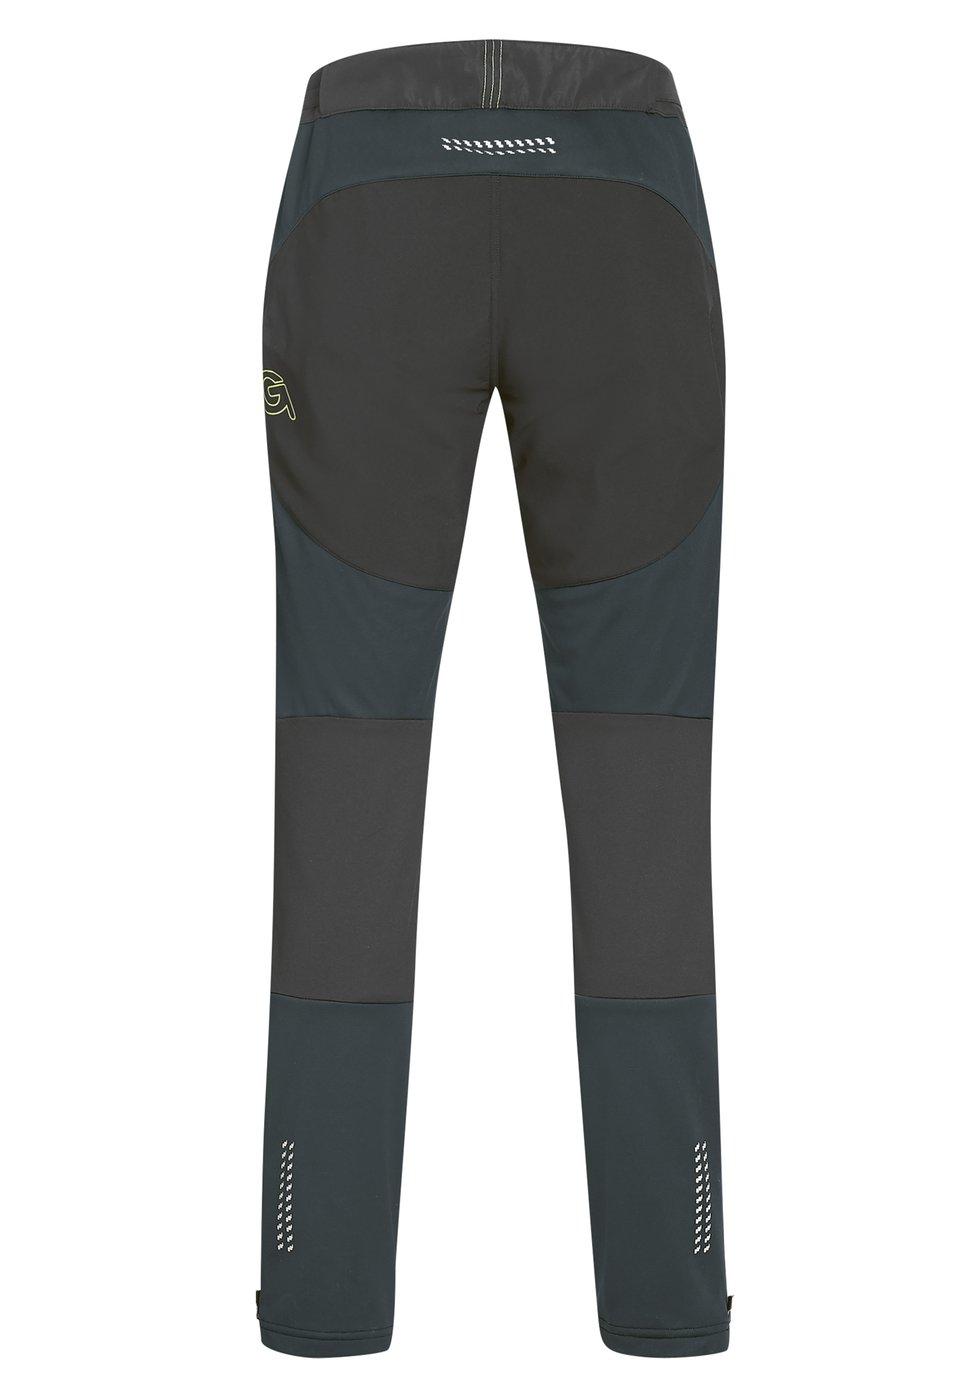 Gonso Norit-Da Uomo Uomo Uomo Softshell Pantaloni MTB (17310) | Sconto  | Consegna Immediata  03b1bb